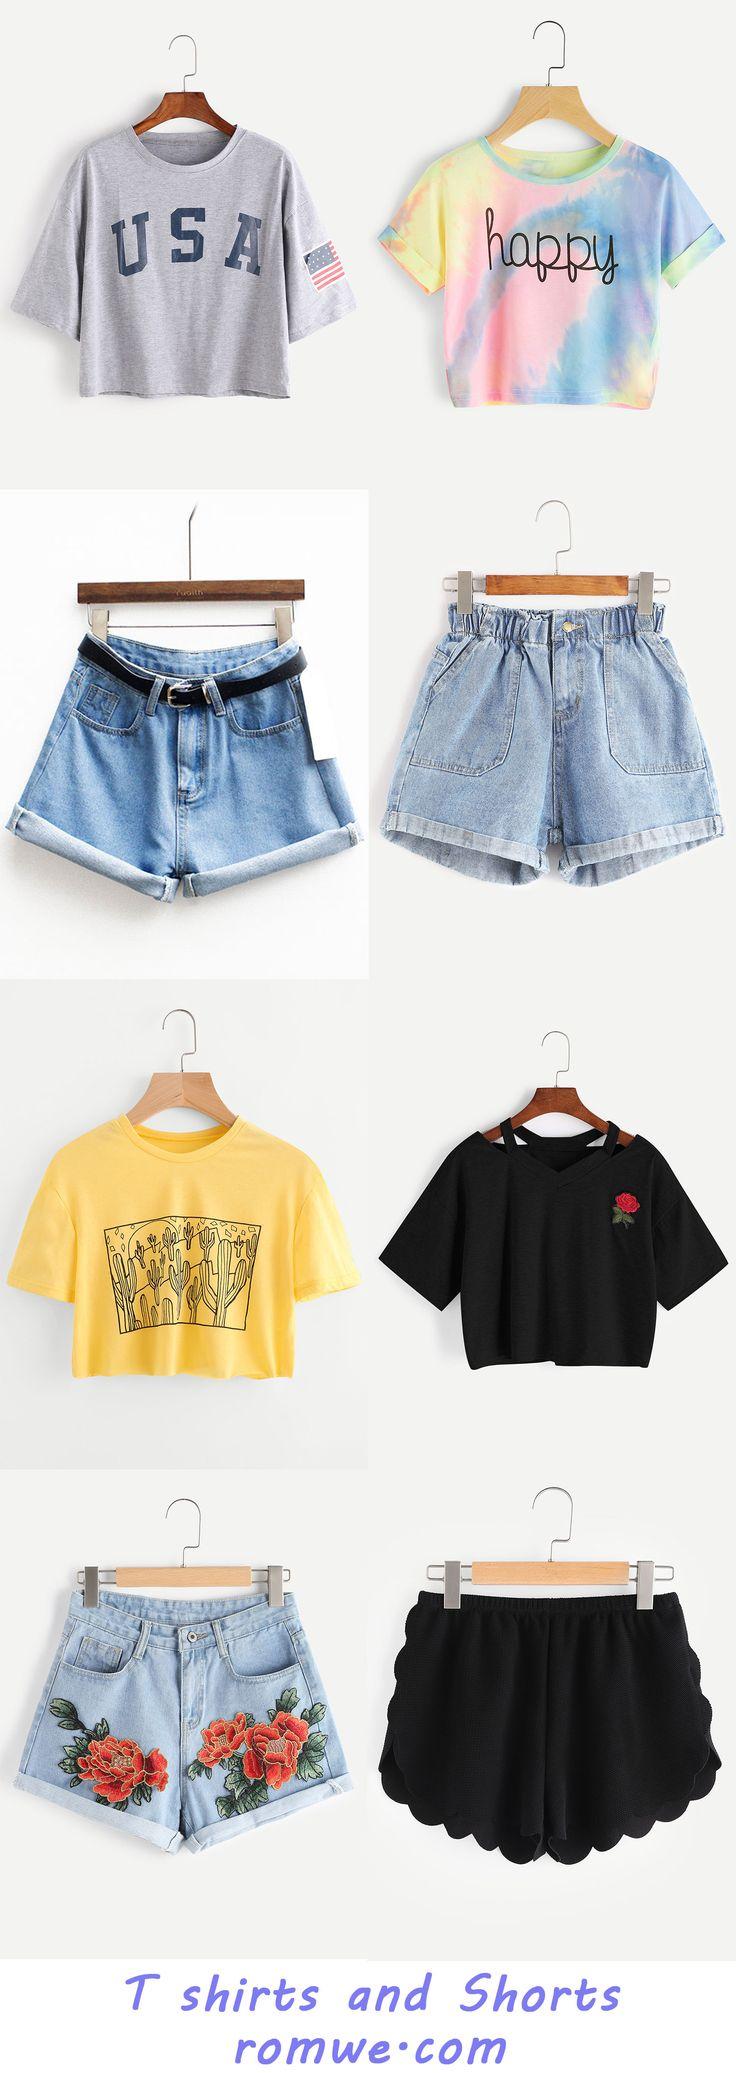 Summer Wear 2017 - rowme.com